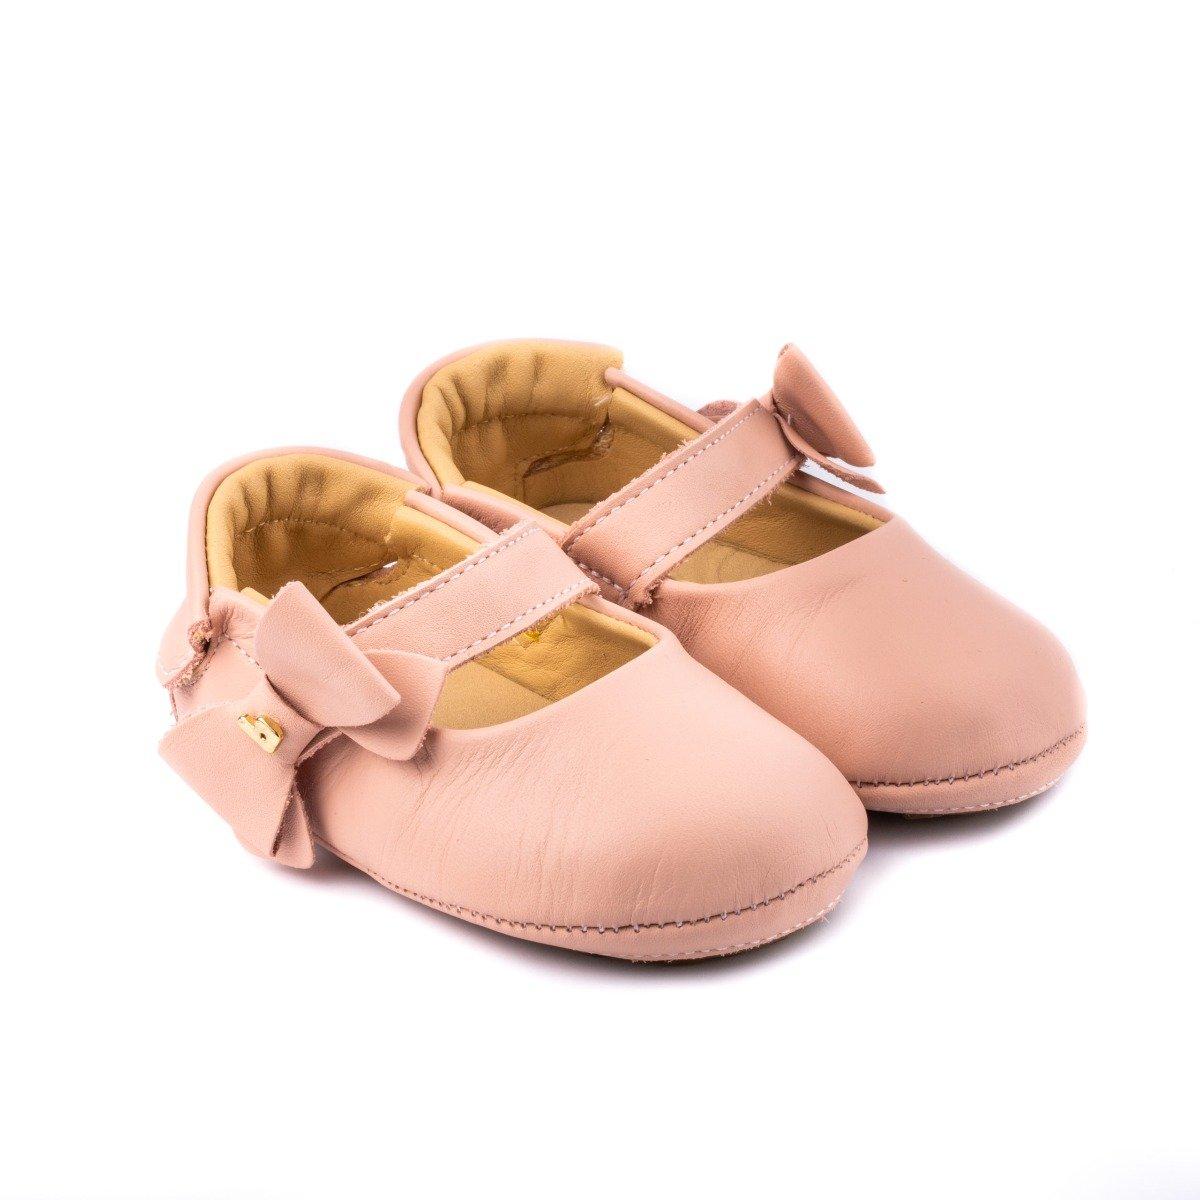 Balerini cu funda Bibi Shoes Afeto Camelia, Roz